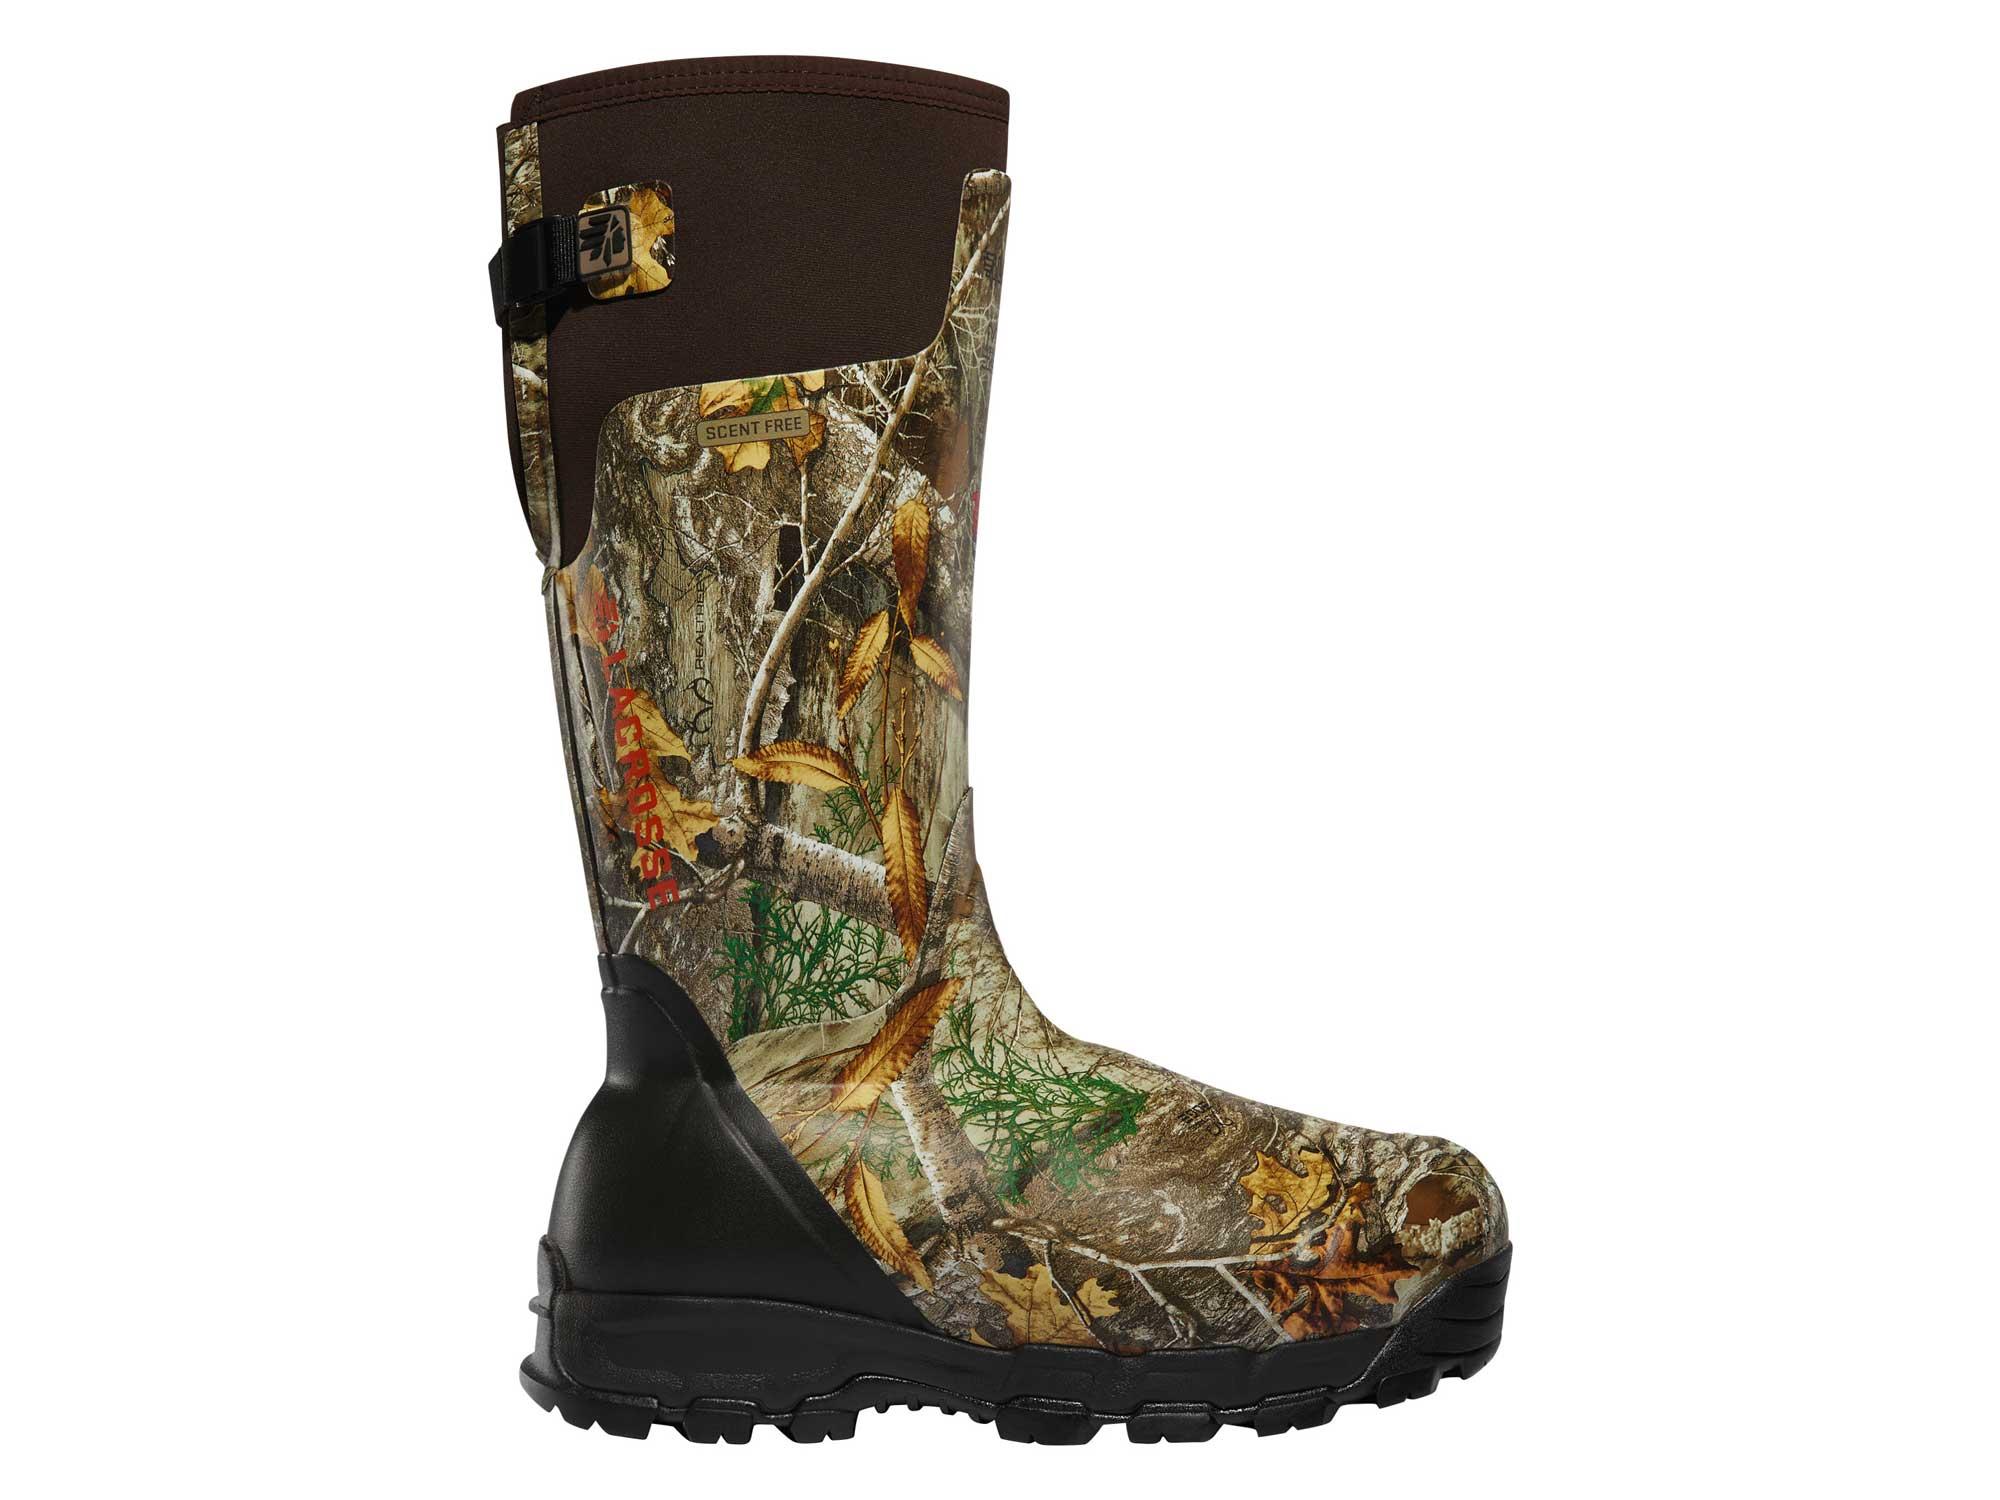 The Alphaburly Pro boots